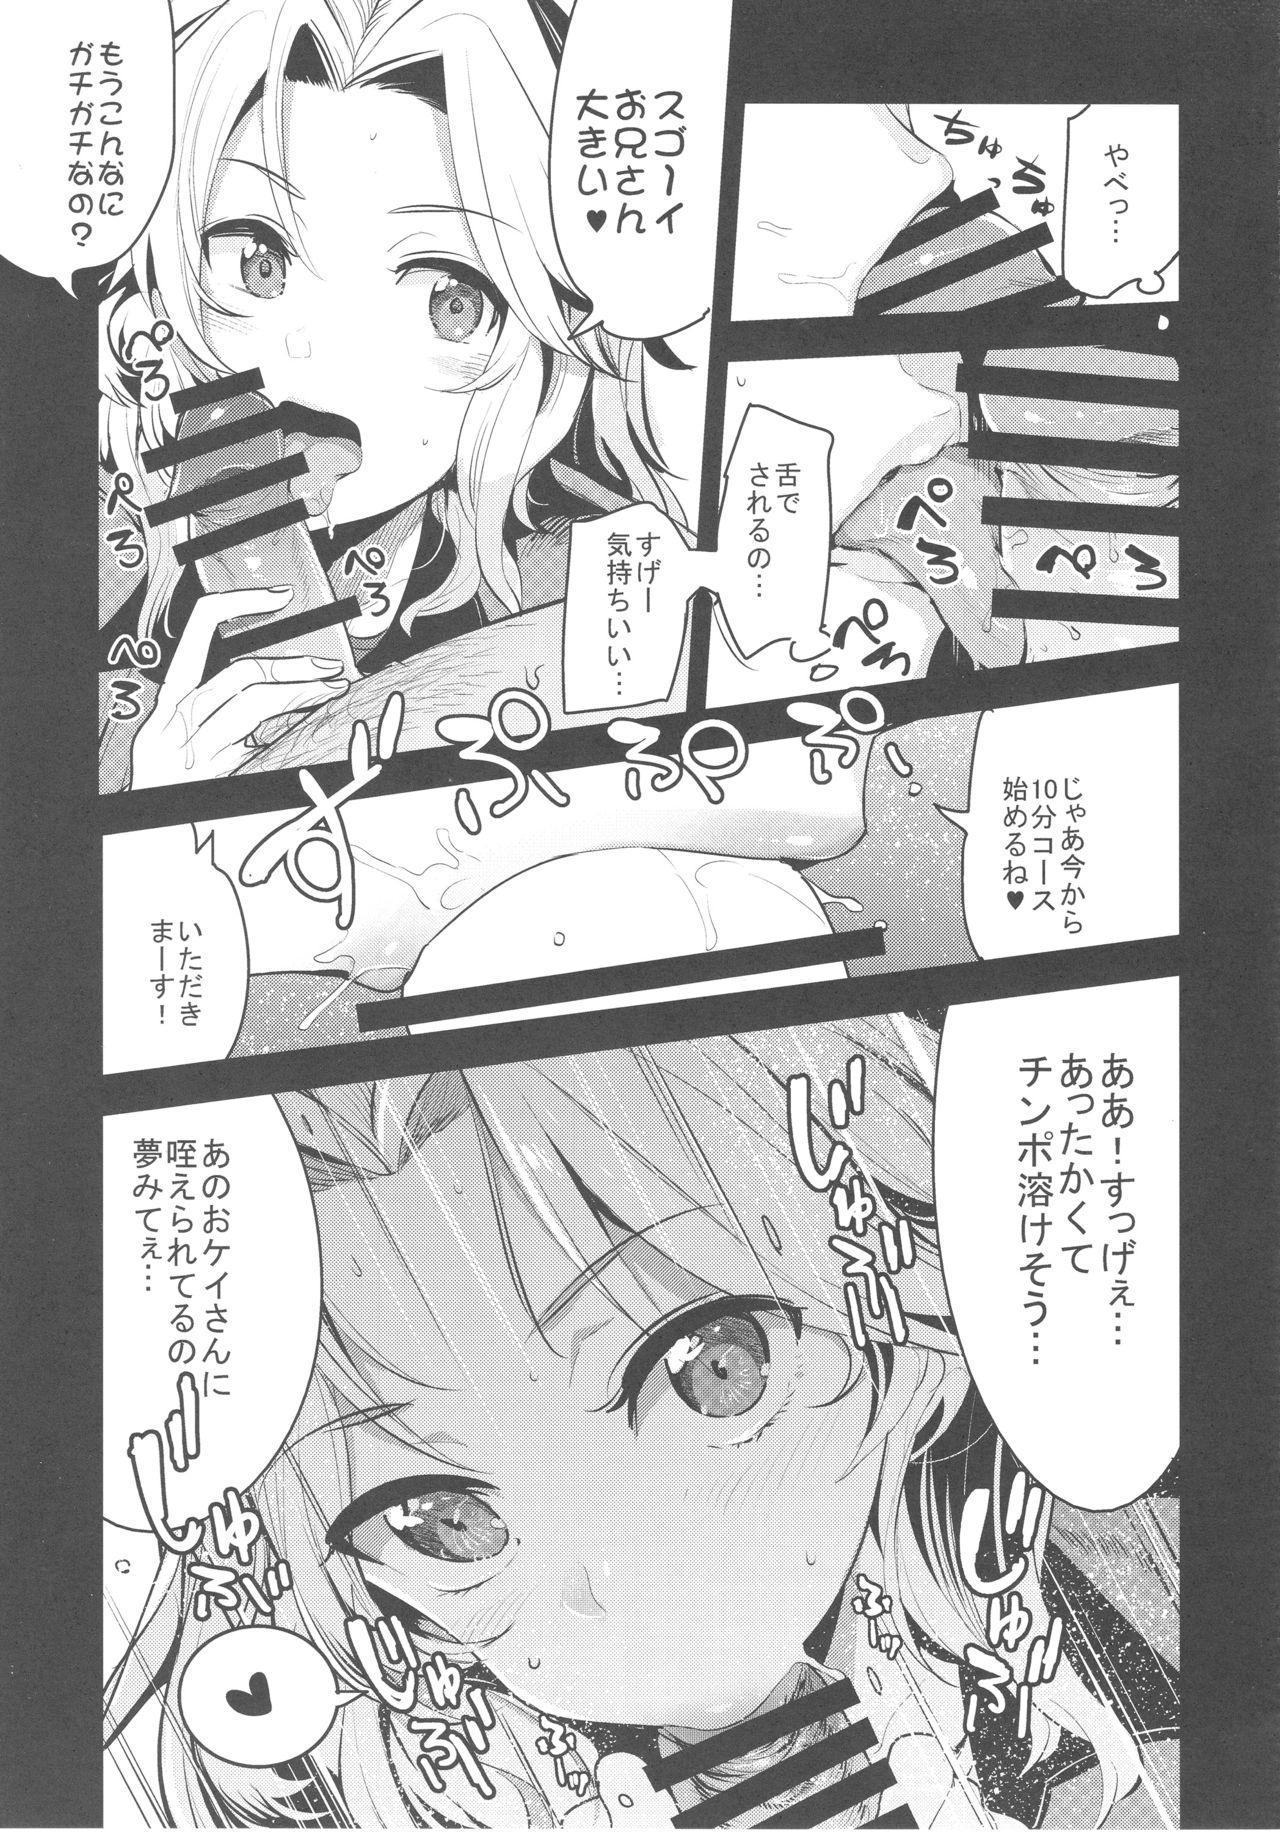 GirlPan Rakugakichou 7 3